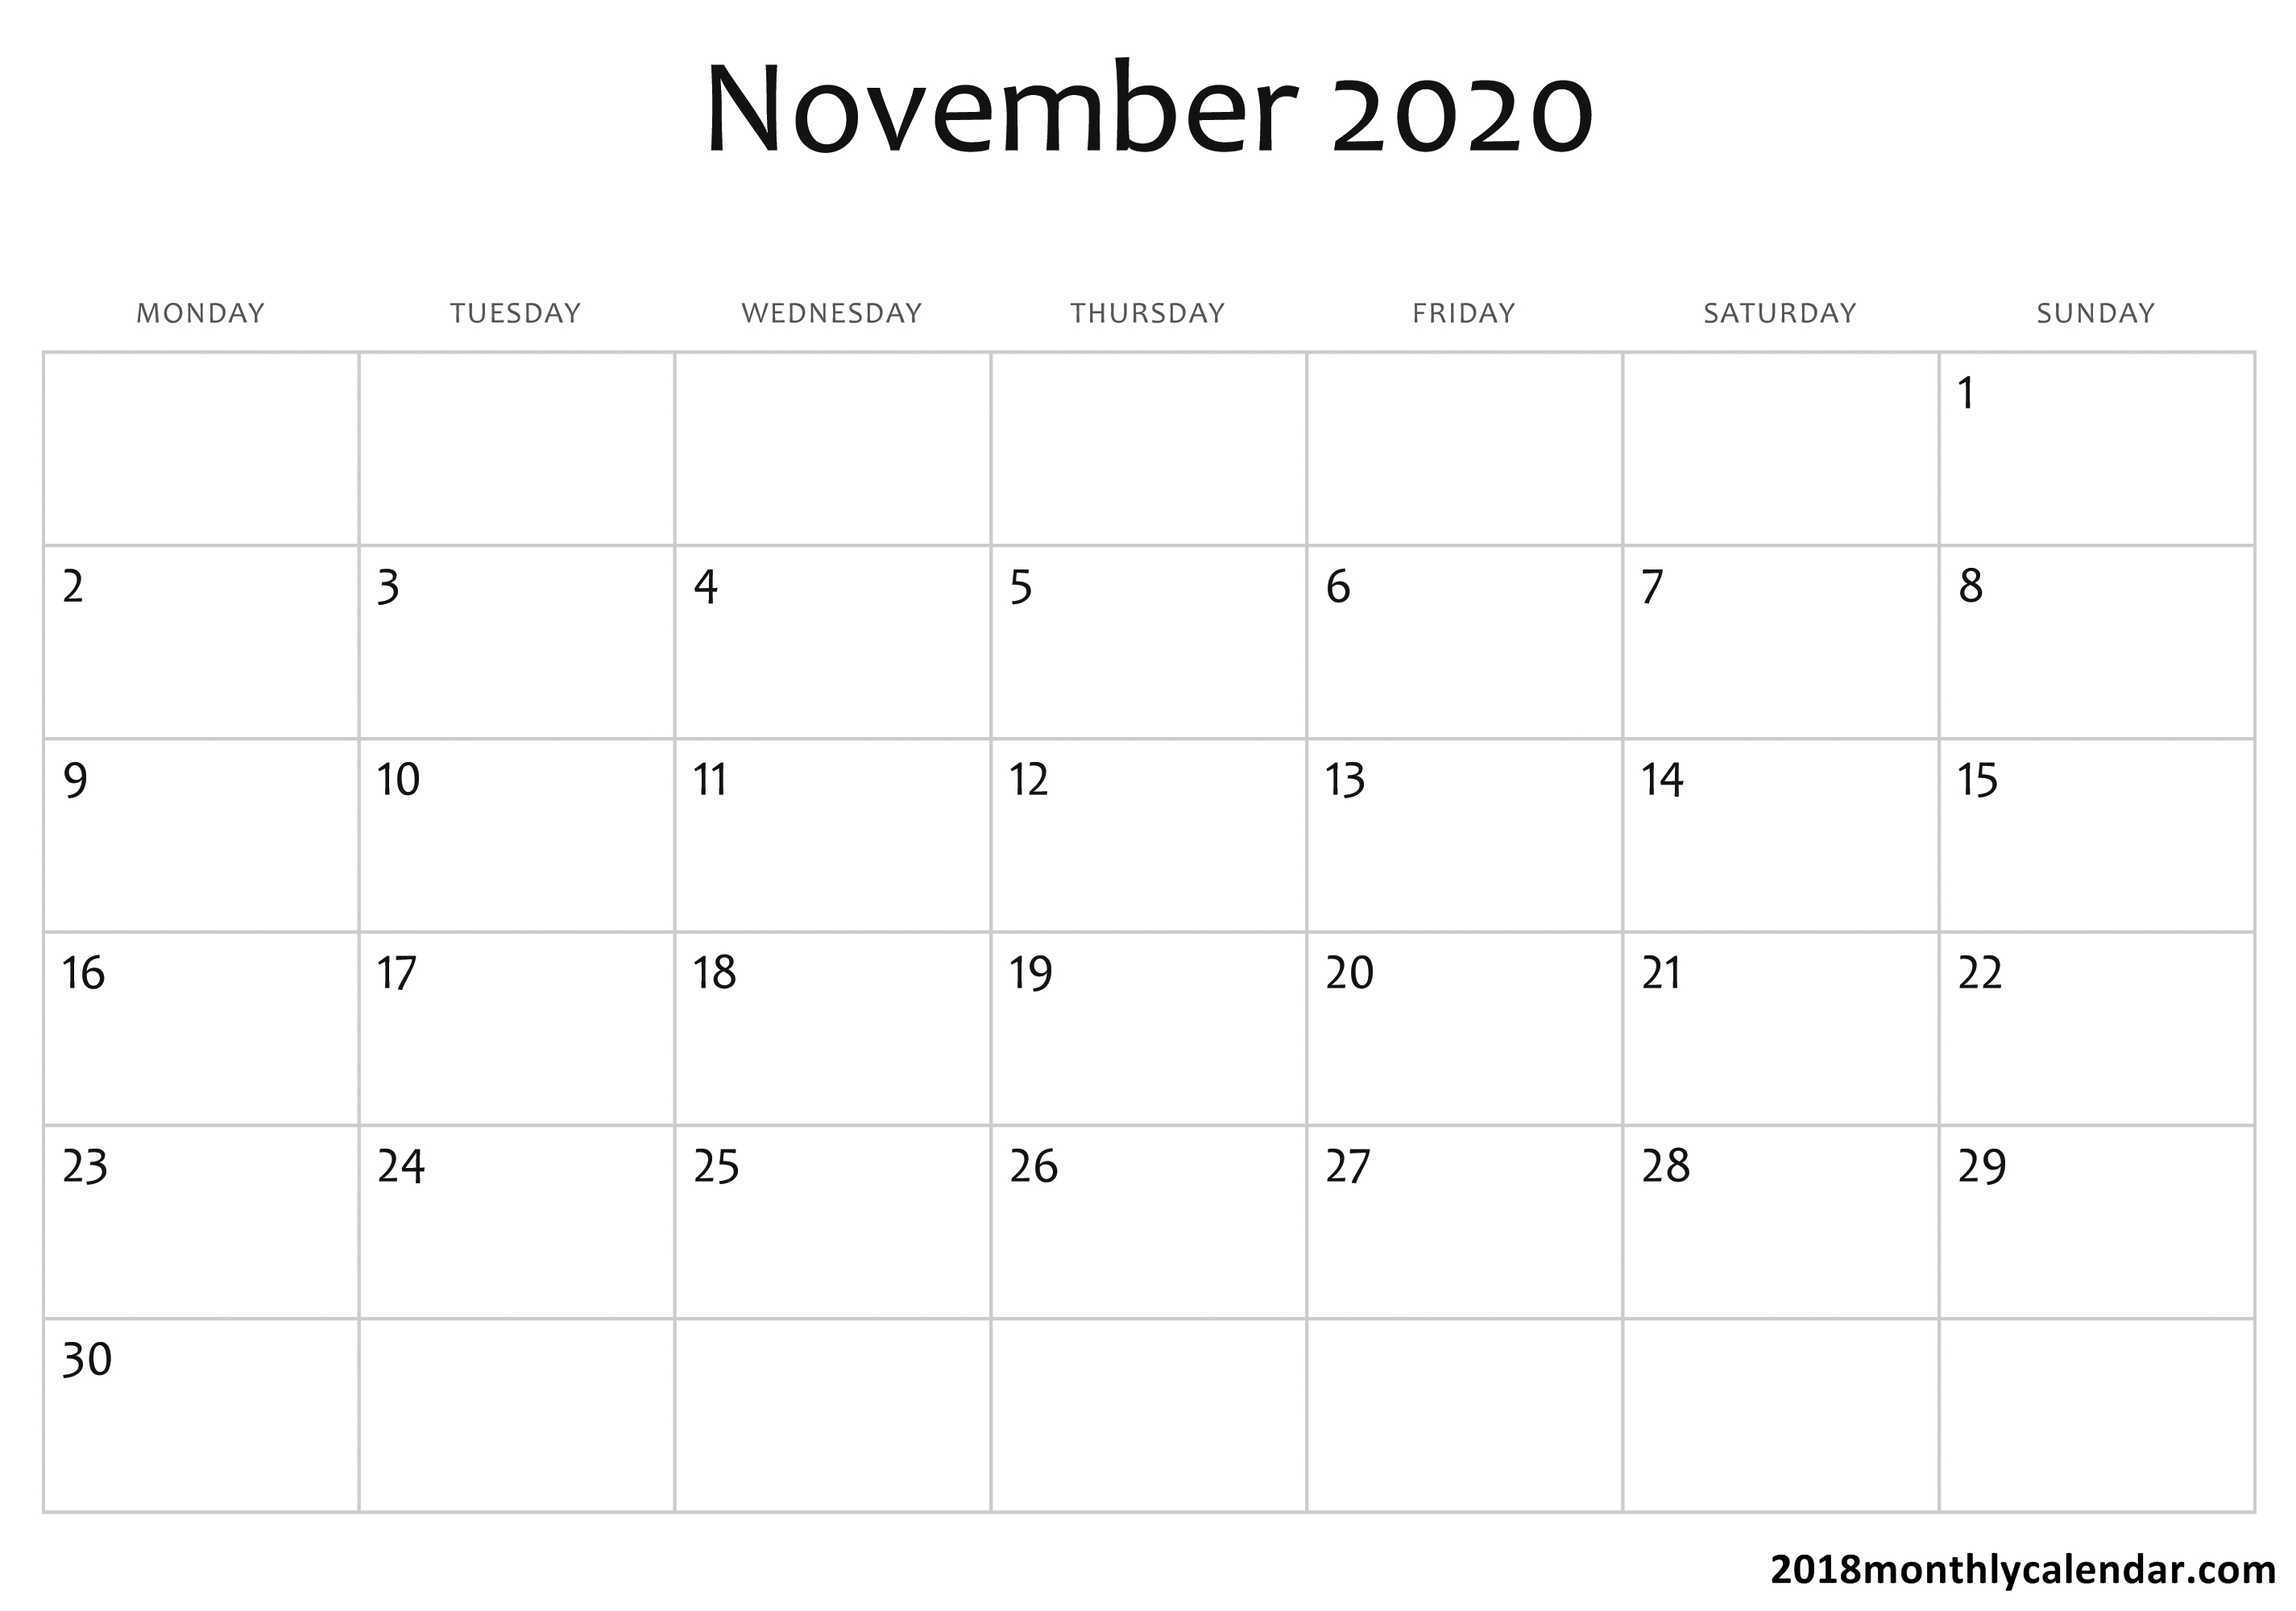 Download November 2020 Calendar – Blank & Editable_Calendar Blank Nov 2020